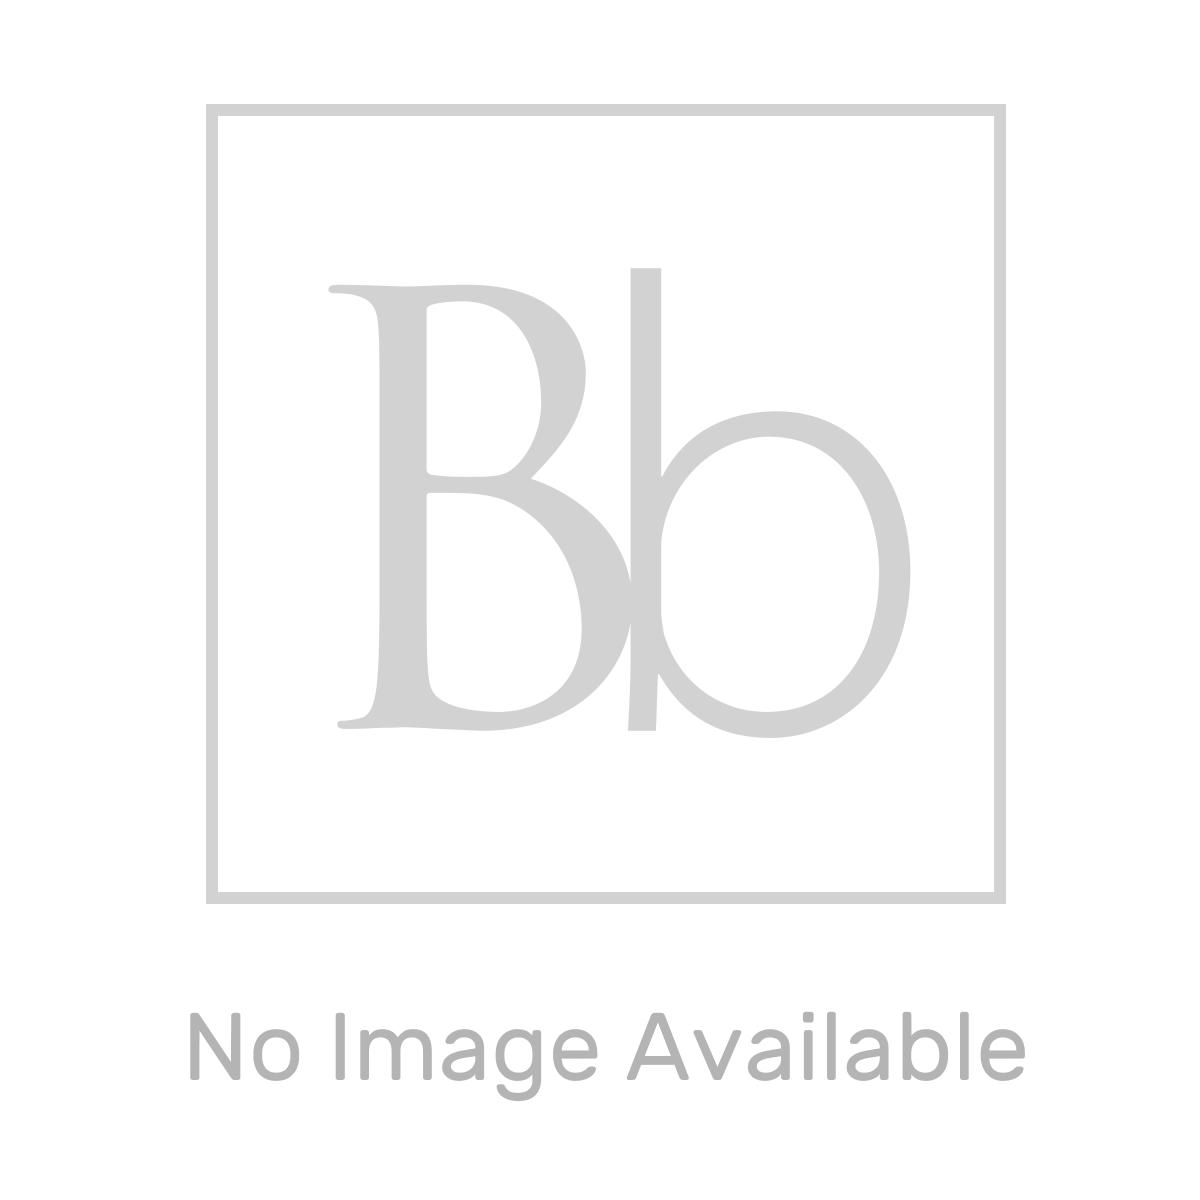 Frontline Aquaglass Onyx Wet Room Shower Enclosure Dimensions